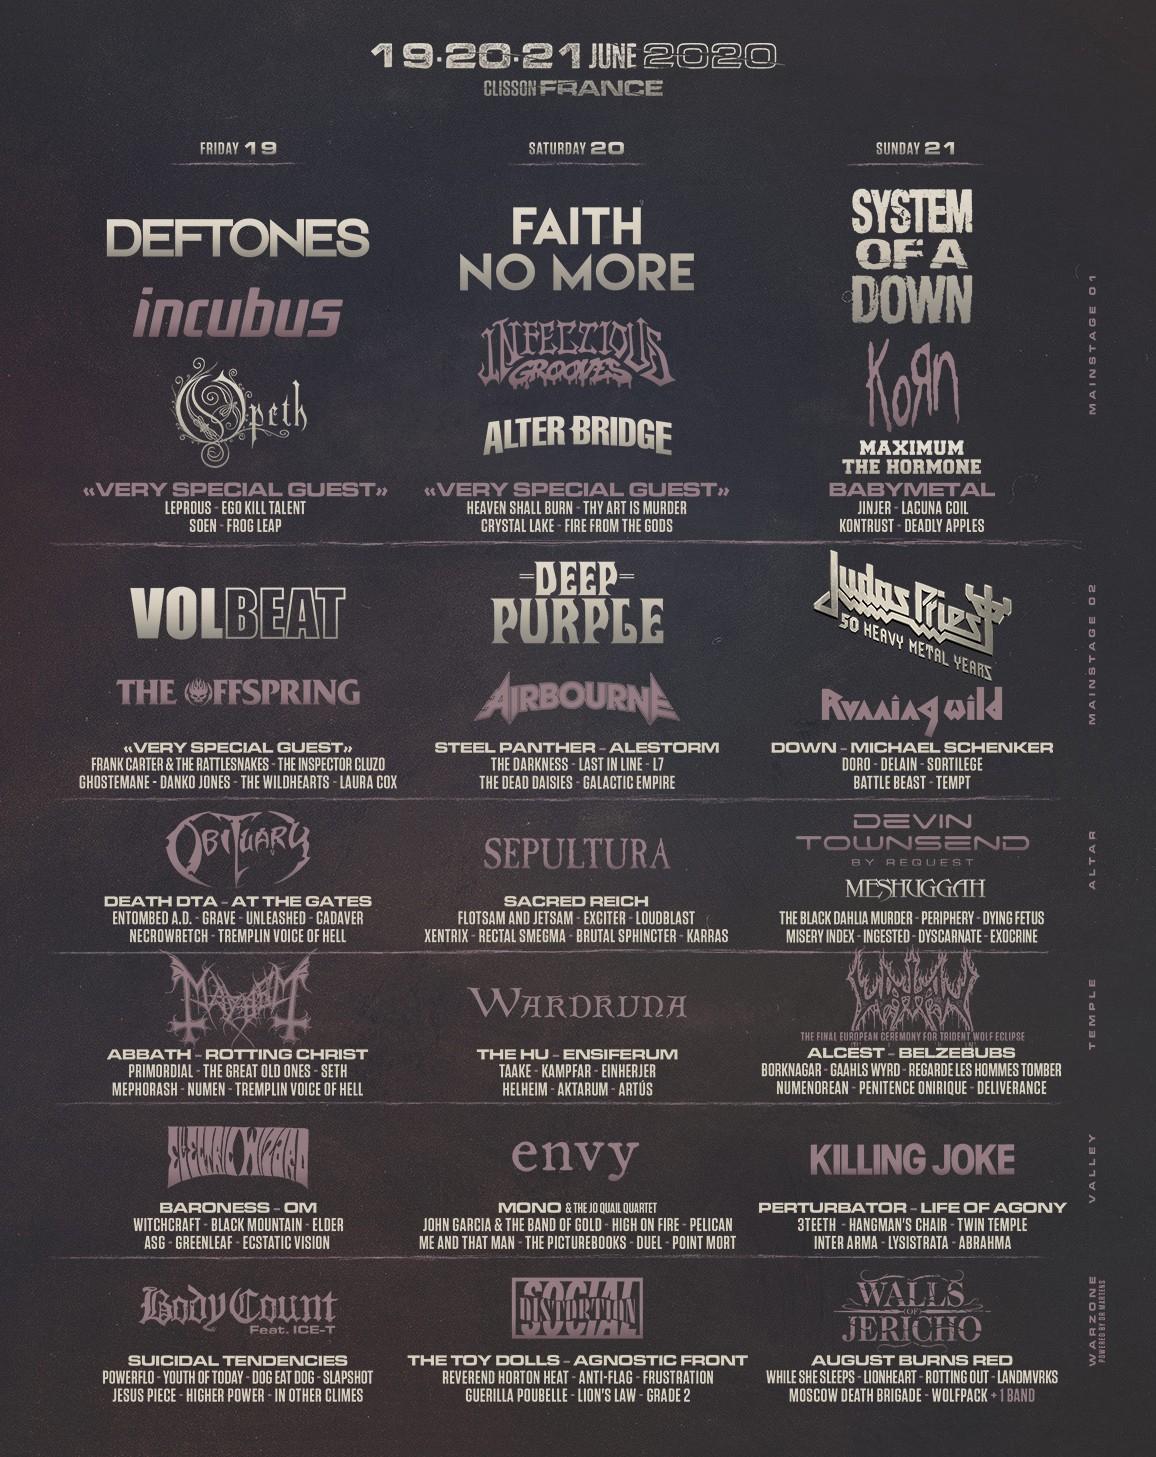 Hellfest-le Paradis en Enfer-Programme-ParisBazaar-Borde